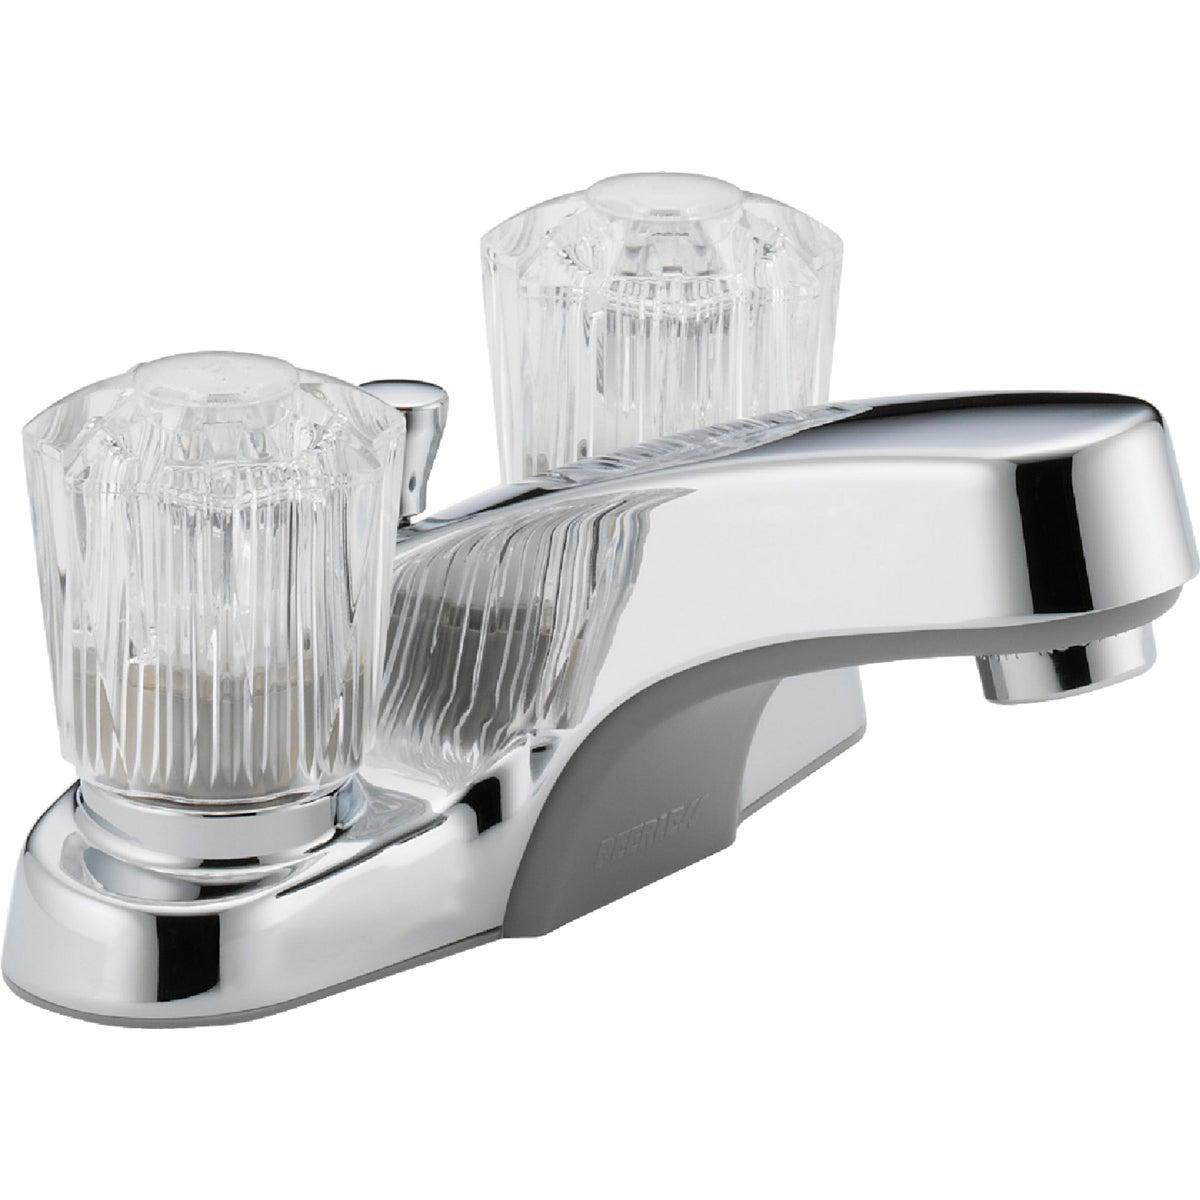 Peerless P245LF Classic Two Handle Lavatory Faucet, Chrome